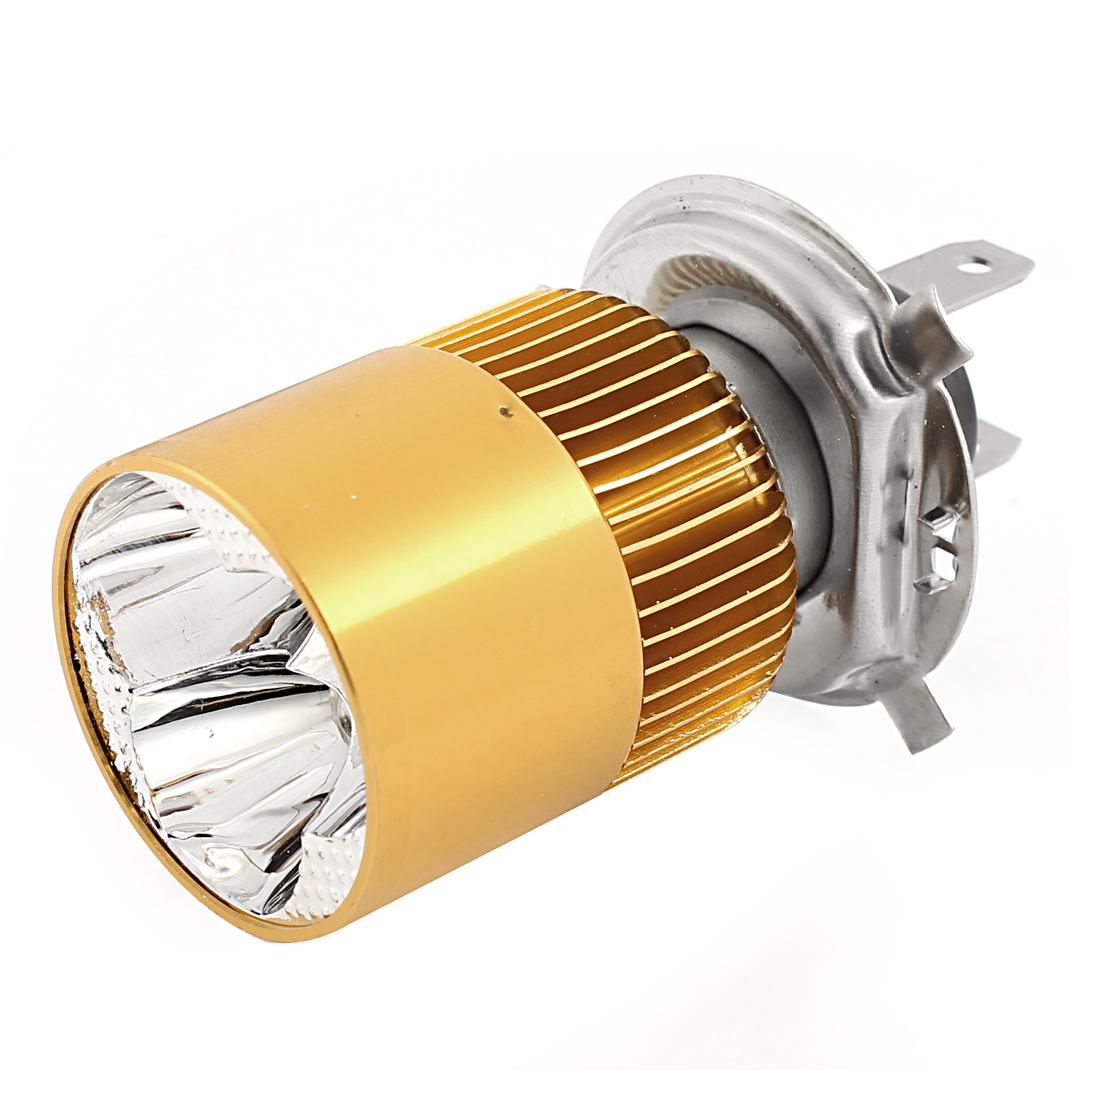 DC 9V-80V 8W Motorcycle Gold Tone Shell H4 White 3 LED Indicator Headlight Fog Lamp